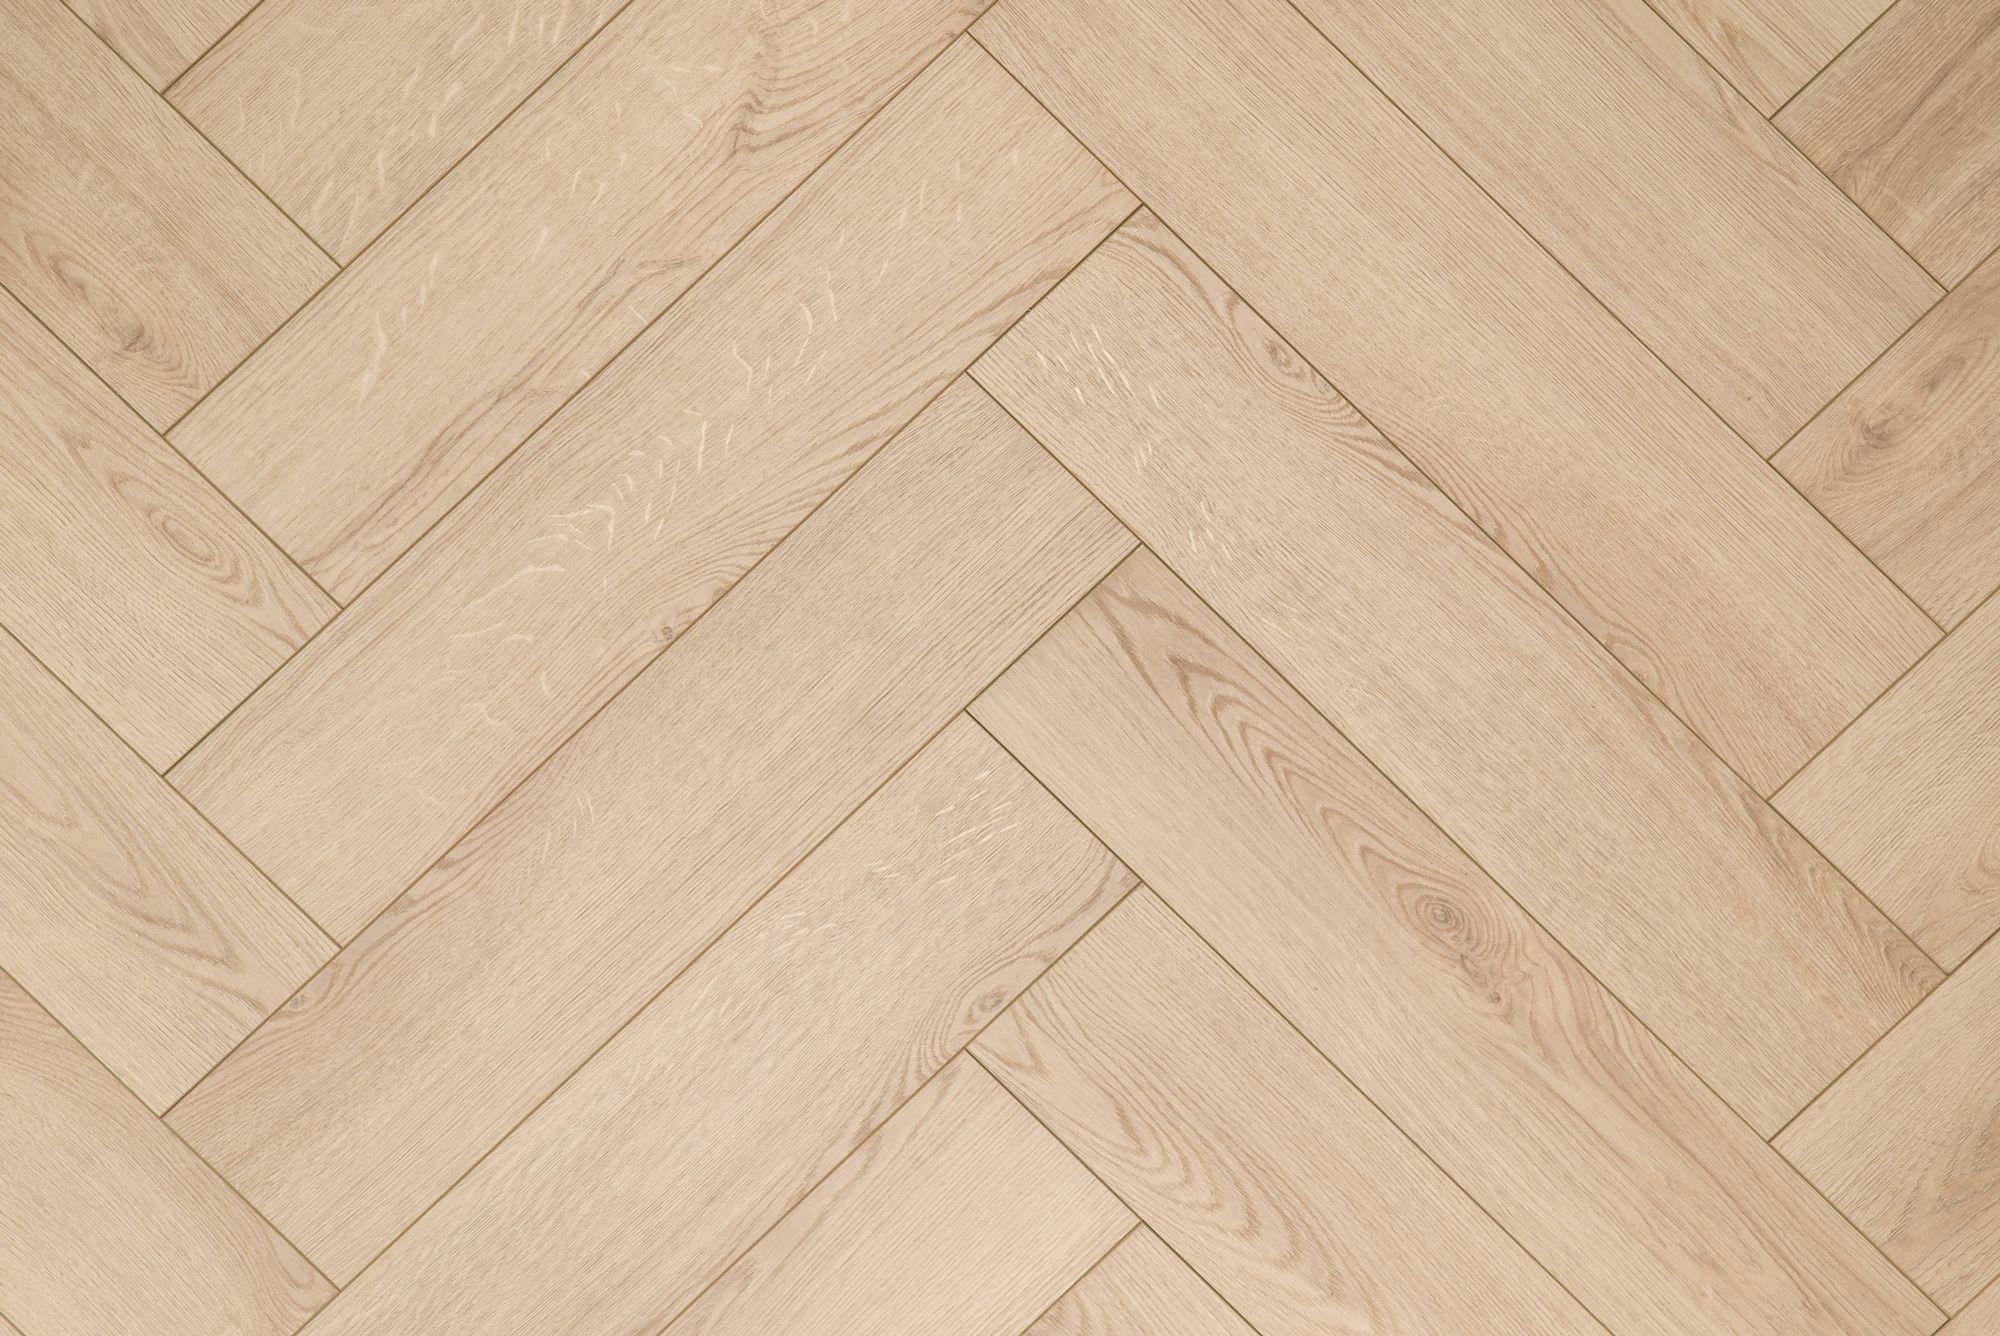 Fesca visgraat laminaat natuur eiken vloer patroon eik ac 6